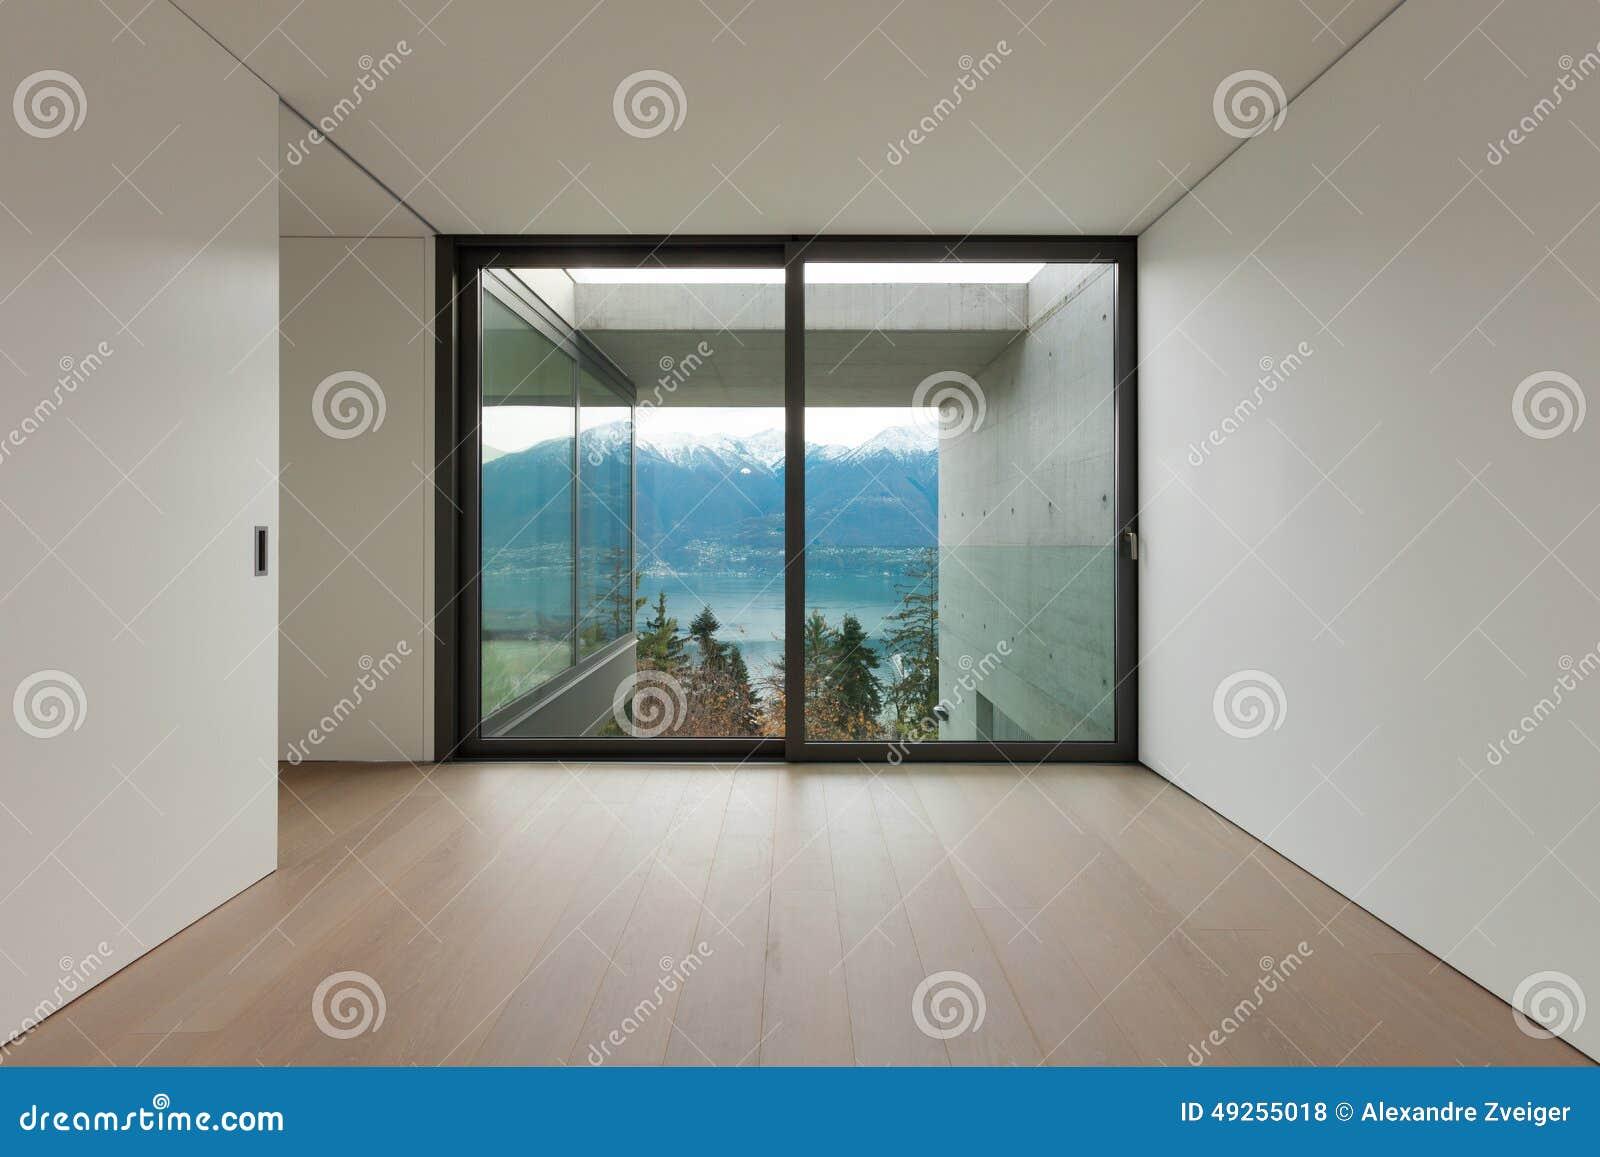 Lege flat, ruimte met venster